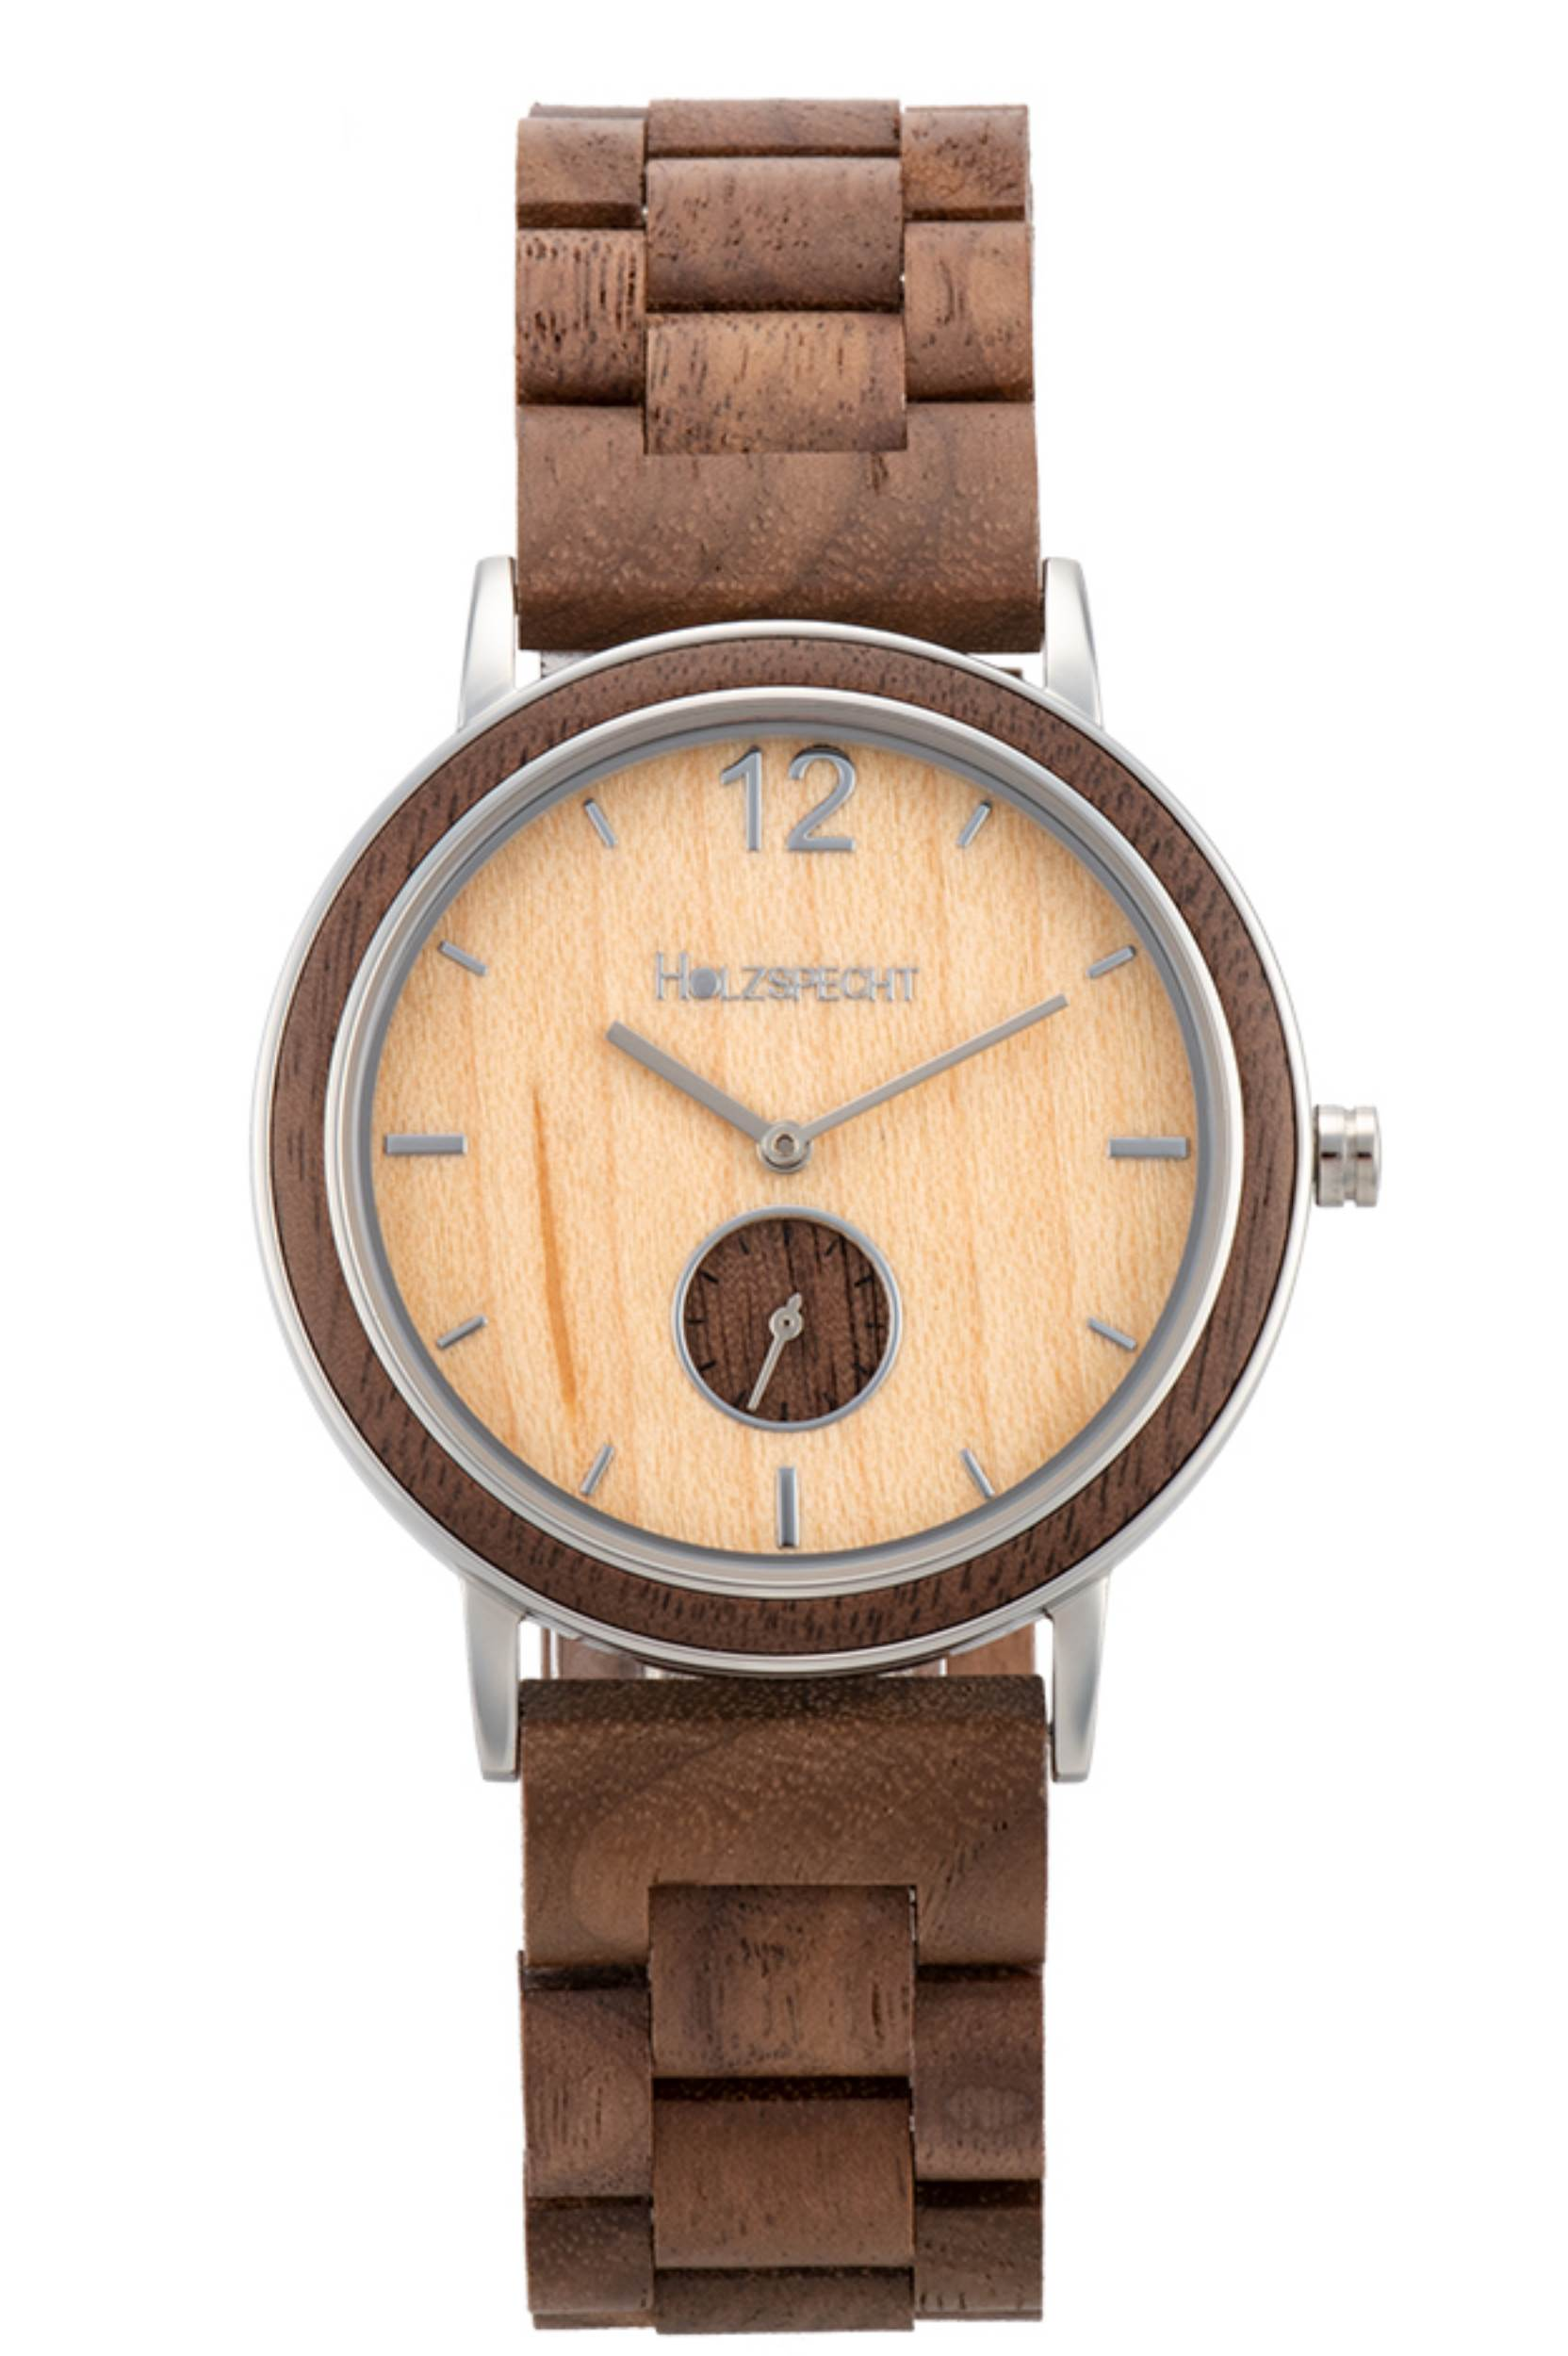 Holzspecht Armbanduhr aus Holz Karwendel Walnuss Ahorn